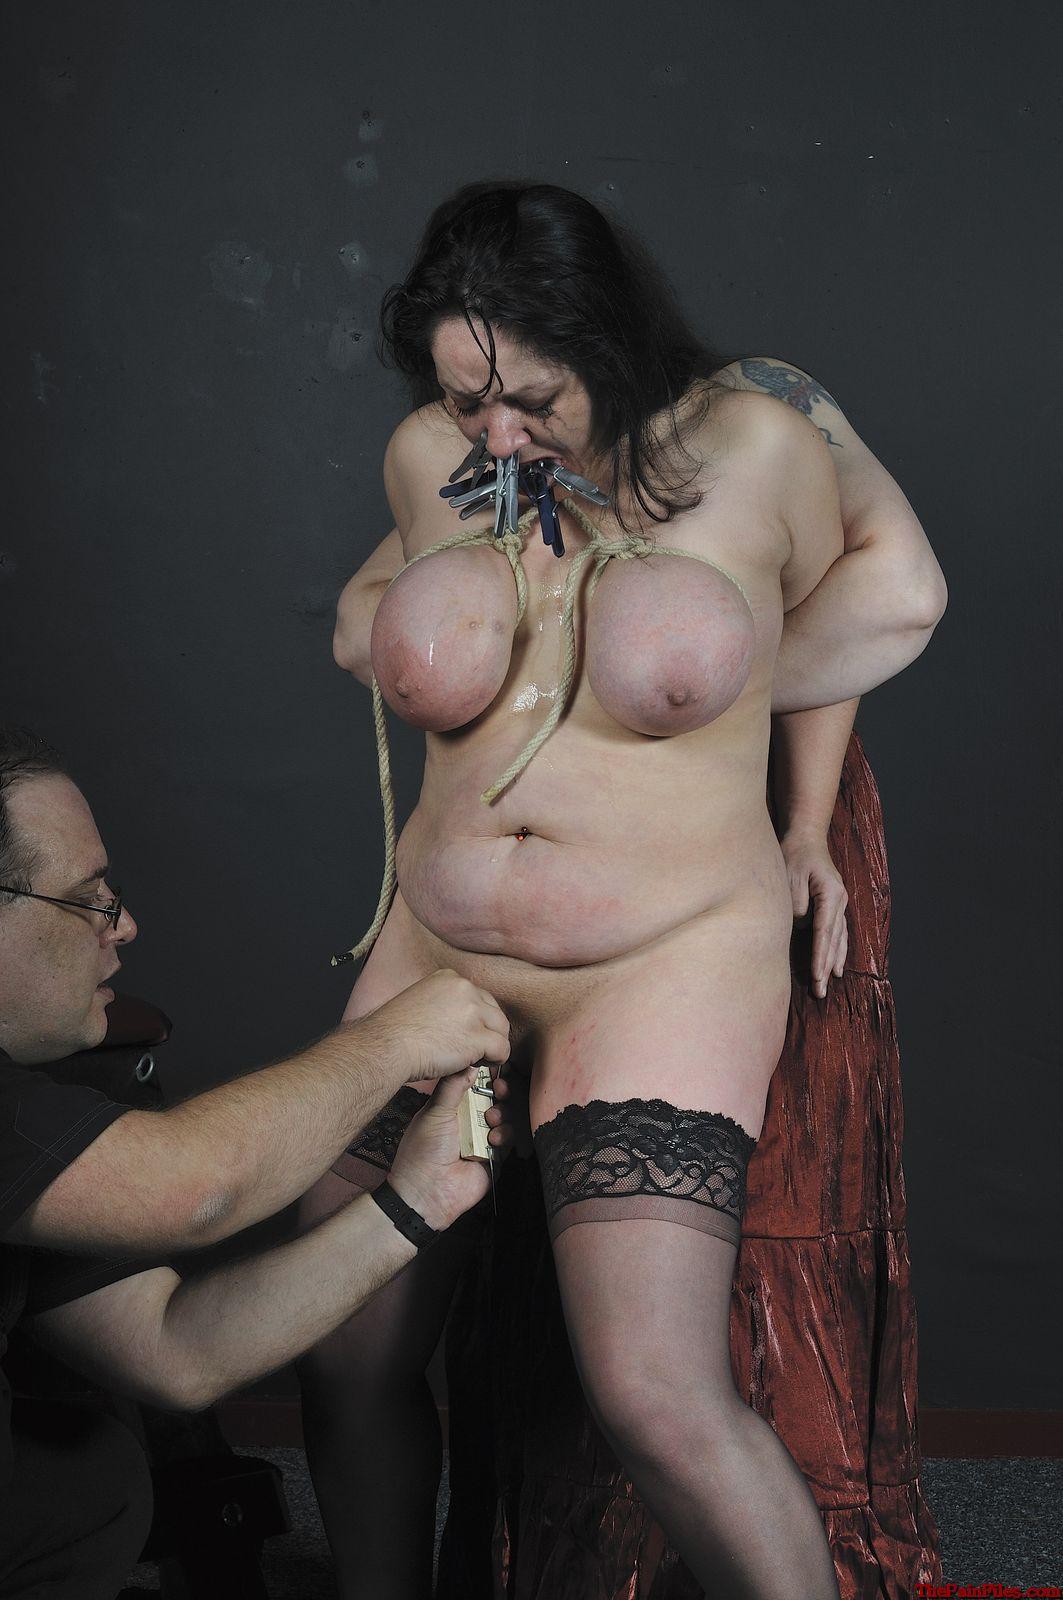 Секс фото с бдмс 2 фотография